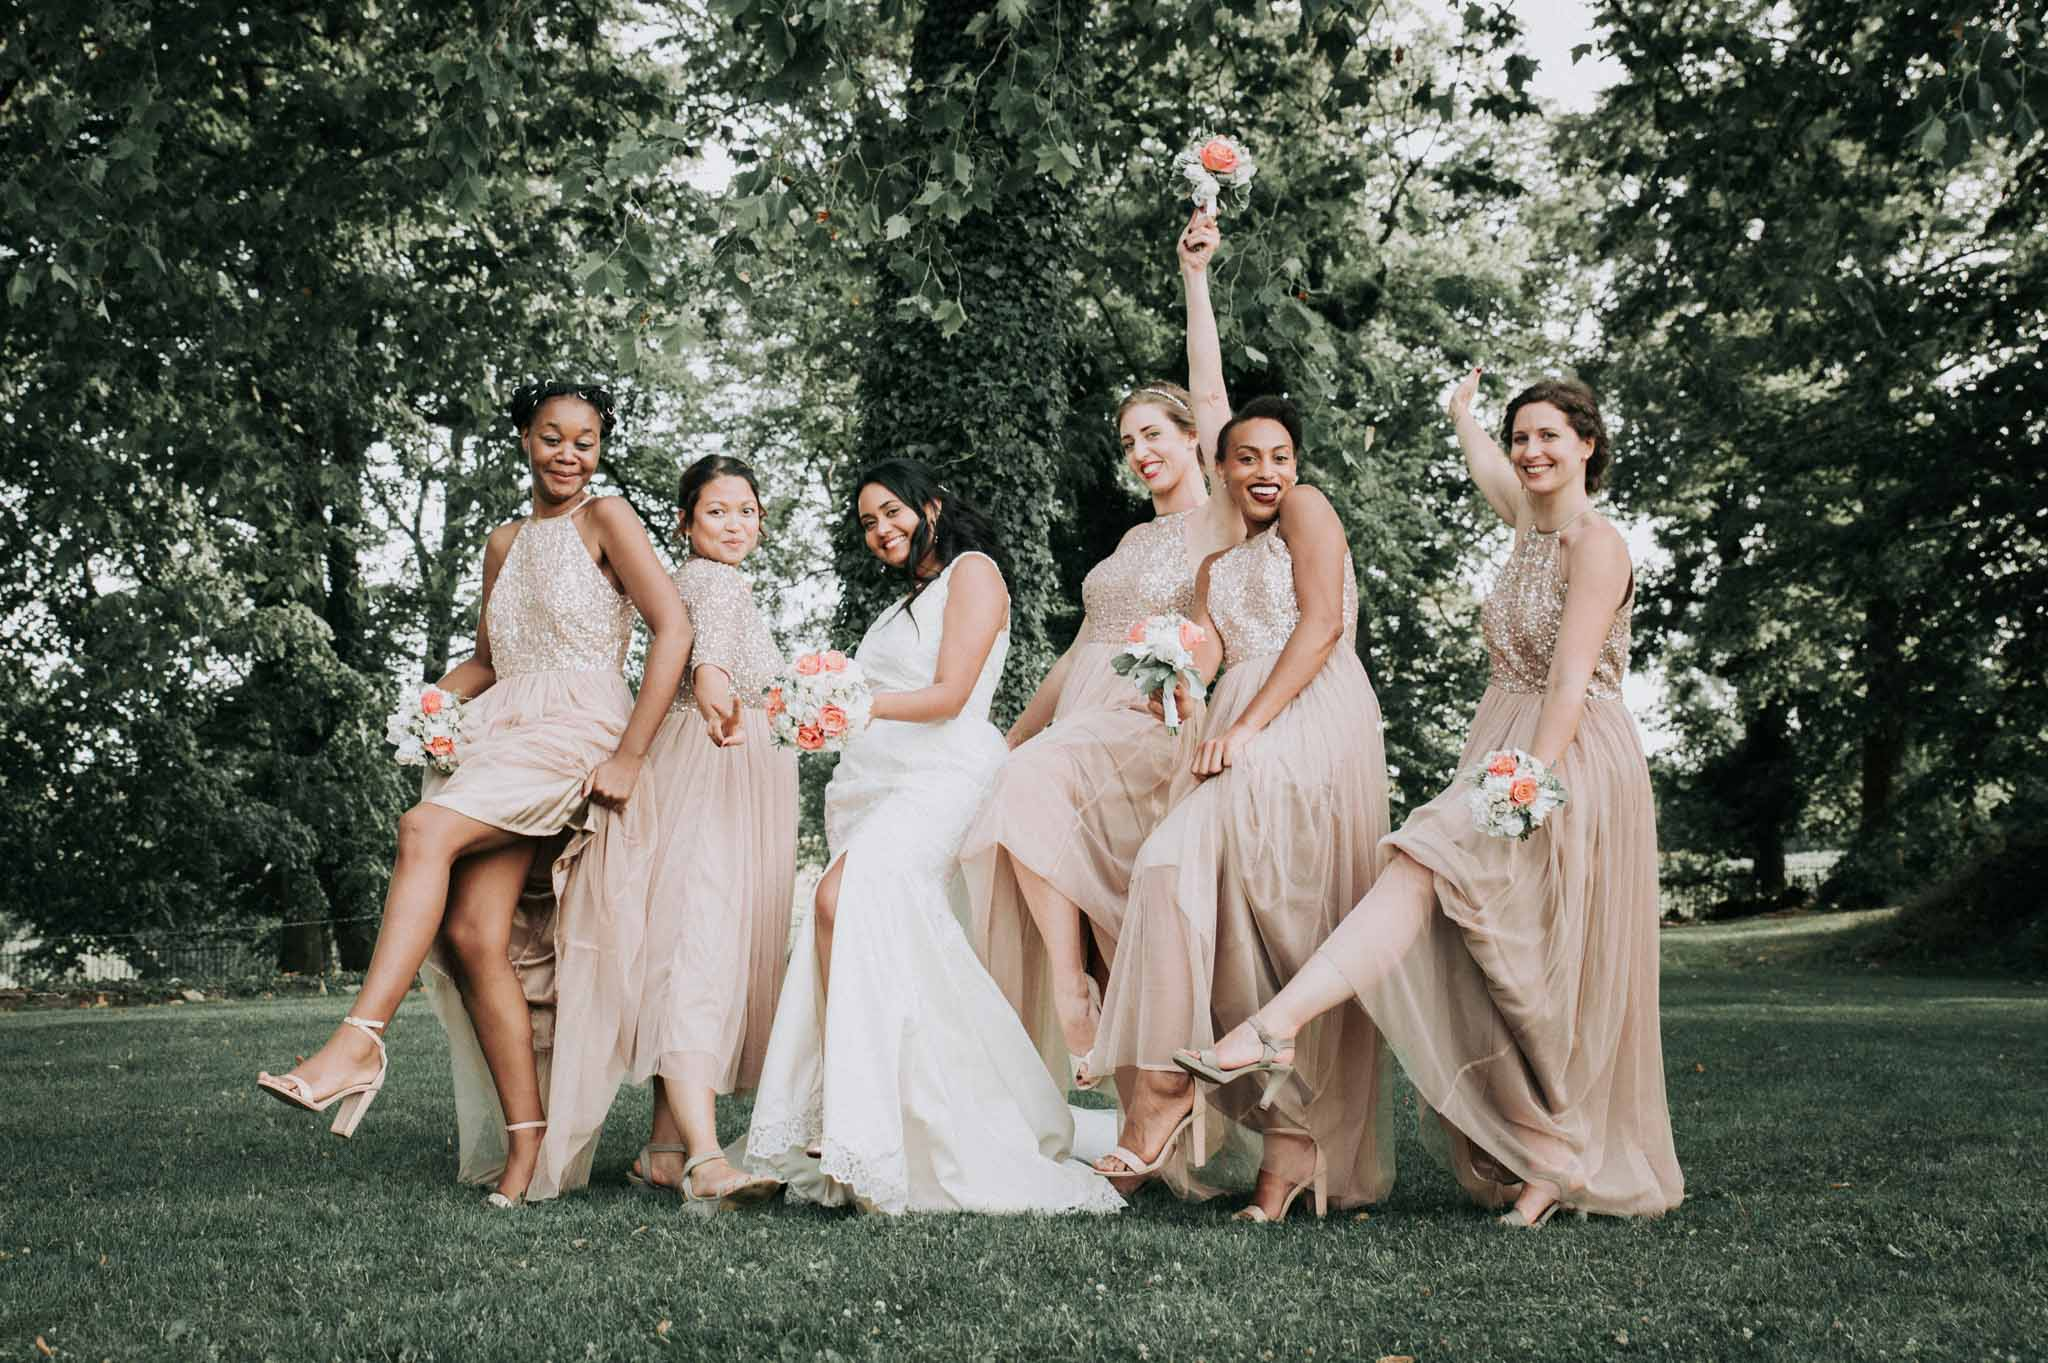 2017-07-15 - DSC_8507 - photographe - mariage - www.lauriediazwedding.com.jpg